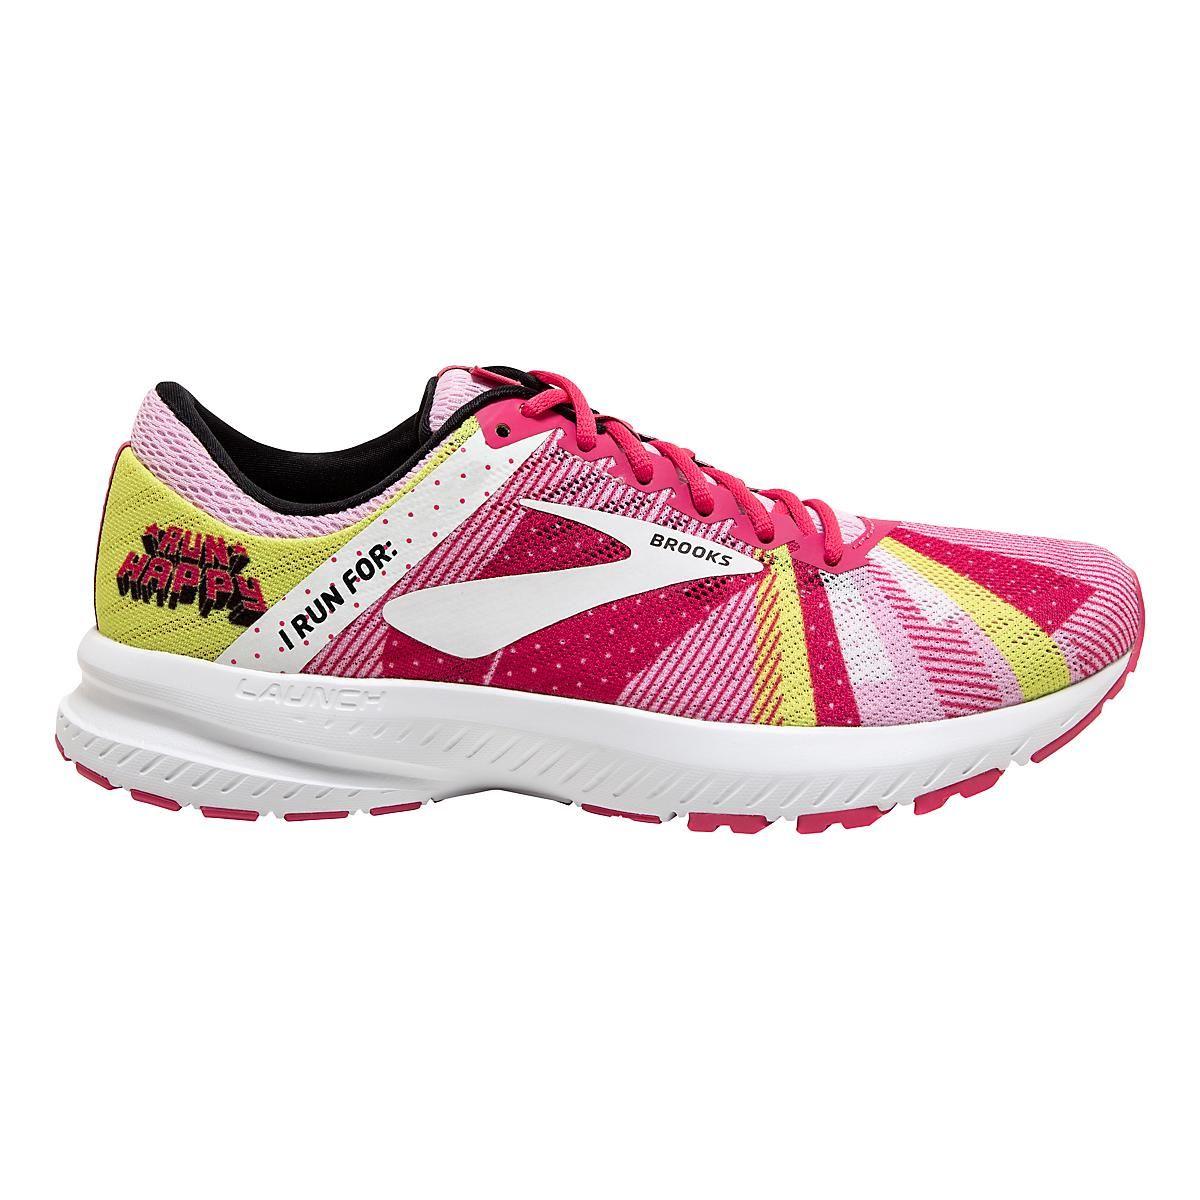 Womens running shoes, Brooks running shoes